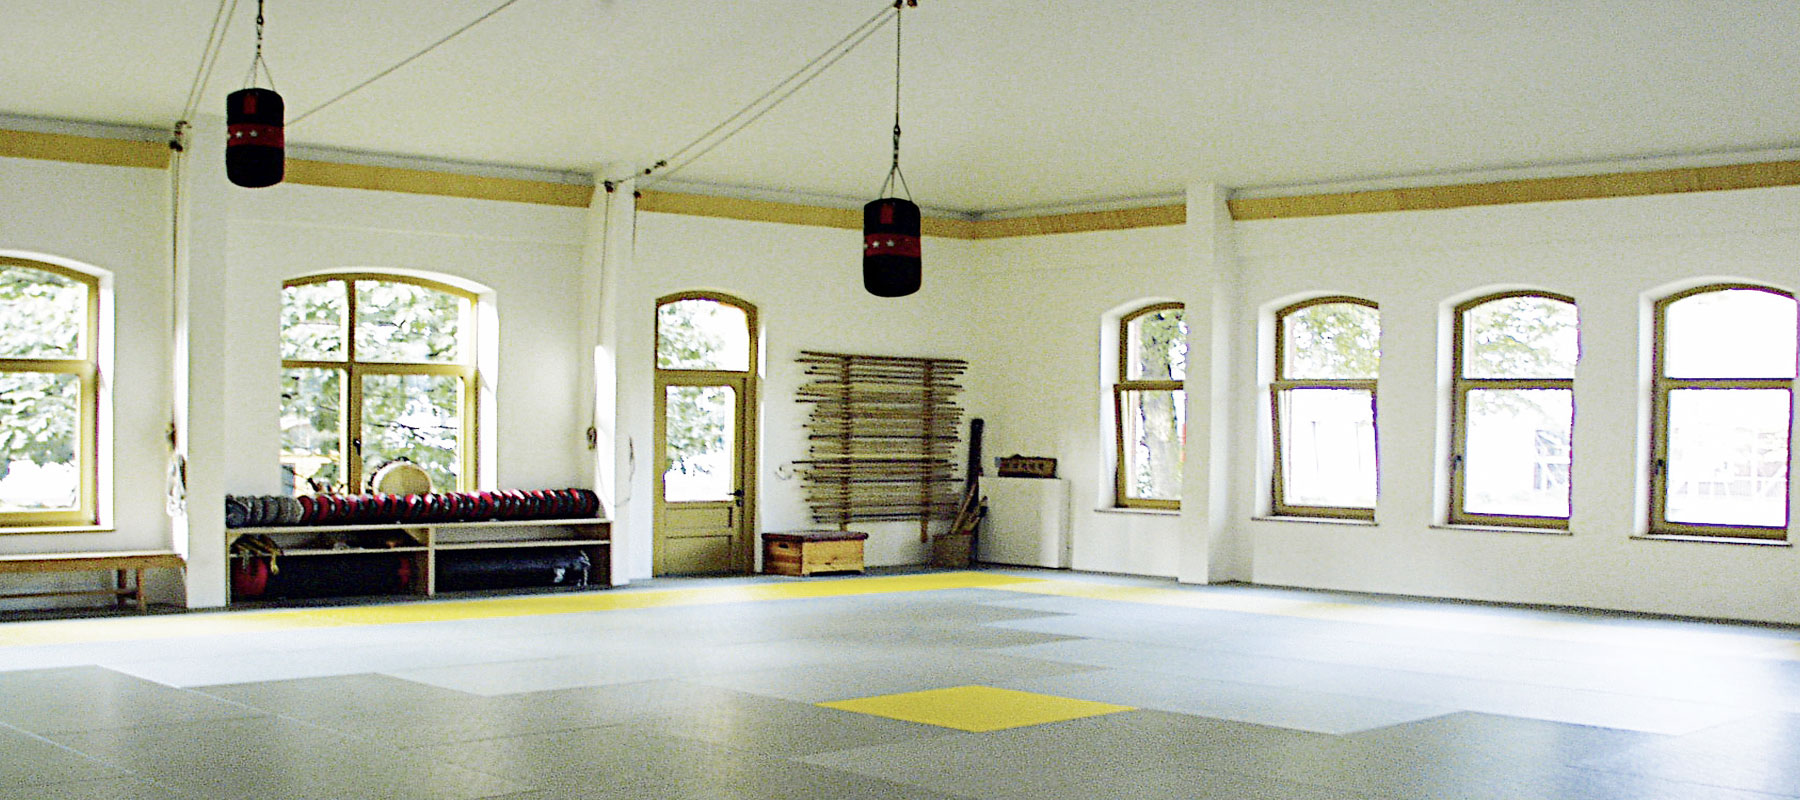 Shinson Hapkido St. Pauli Dojang